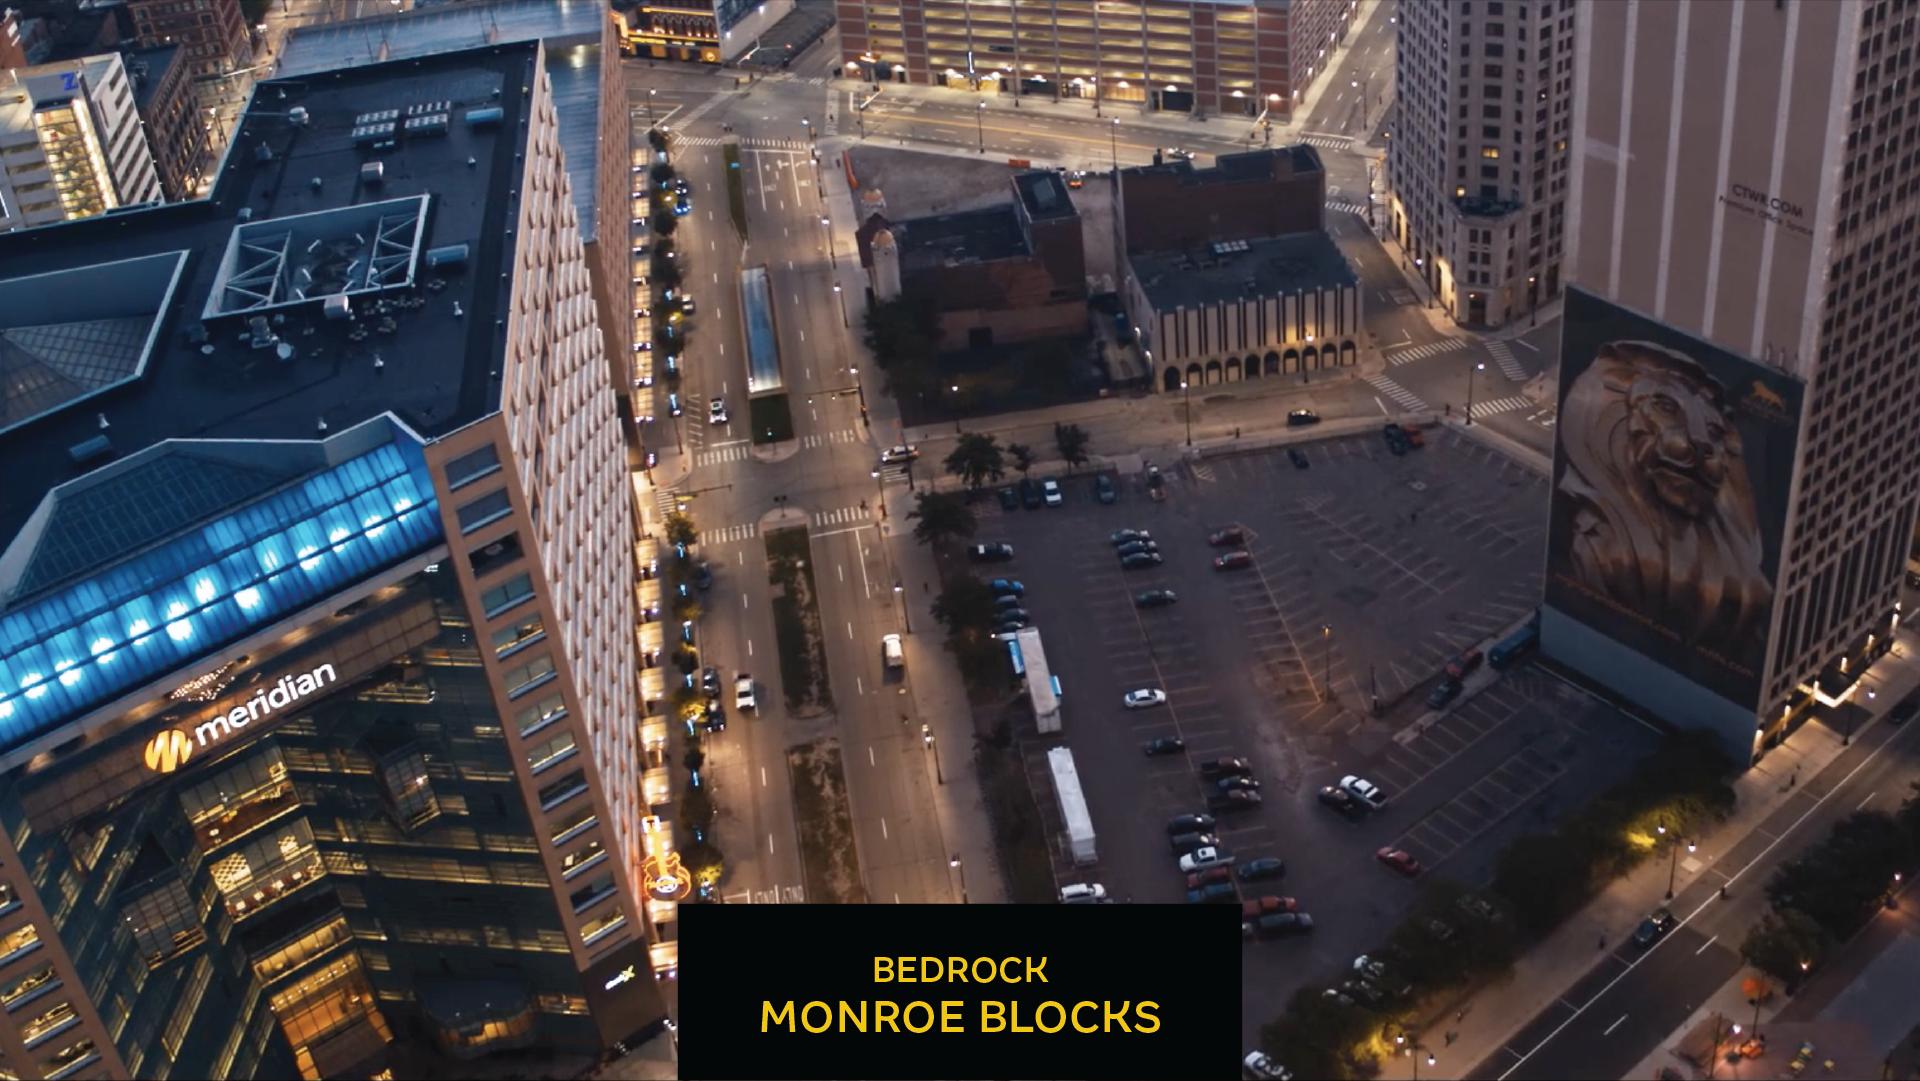 Monroe Blocks